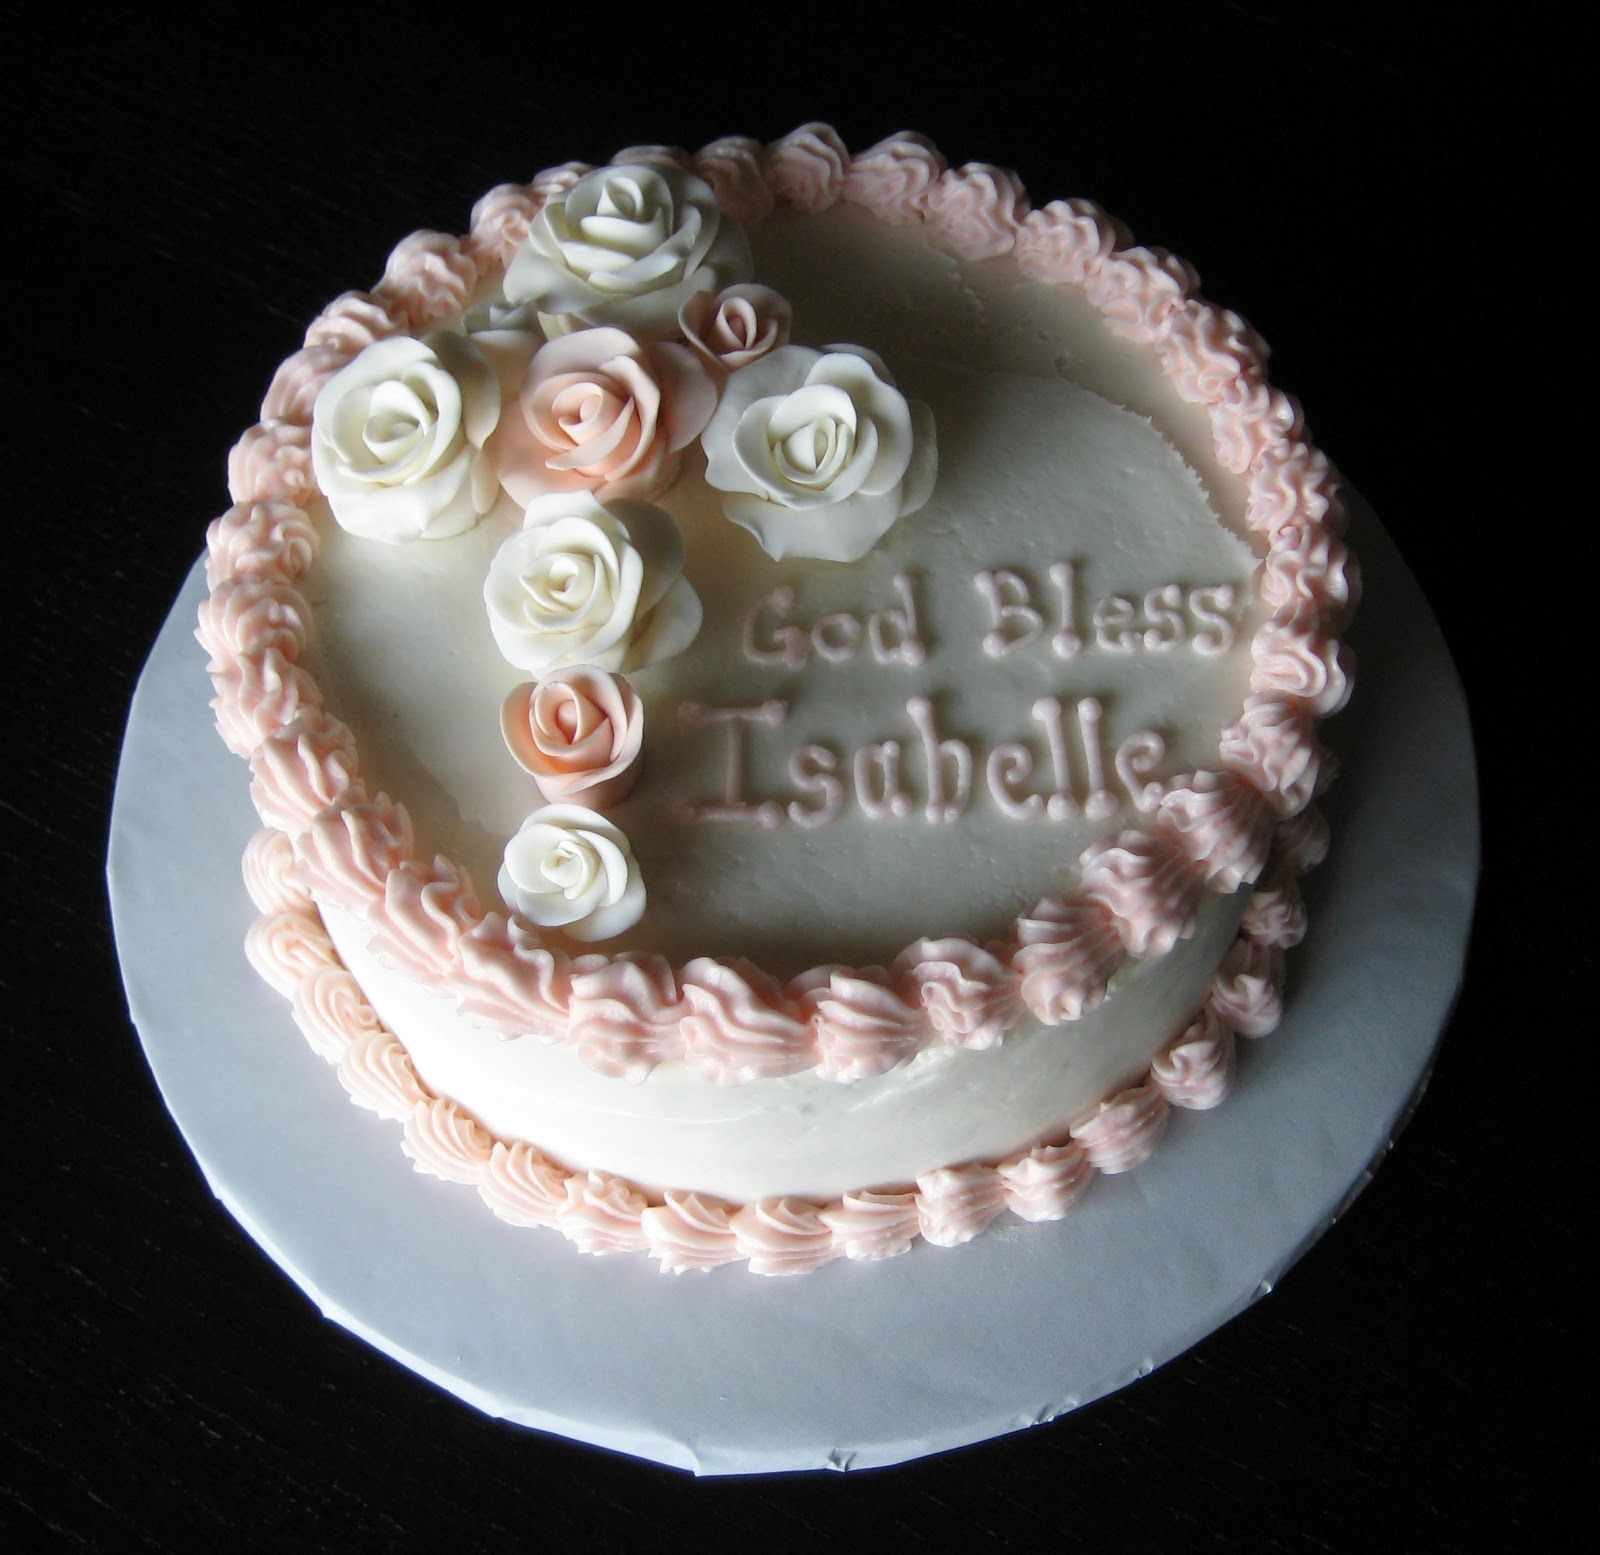 baptism cakes Custom Cakes by Julie: Baptism Cake III ...